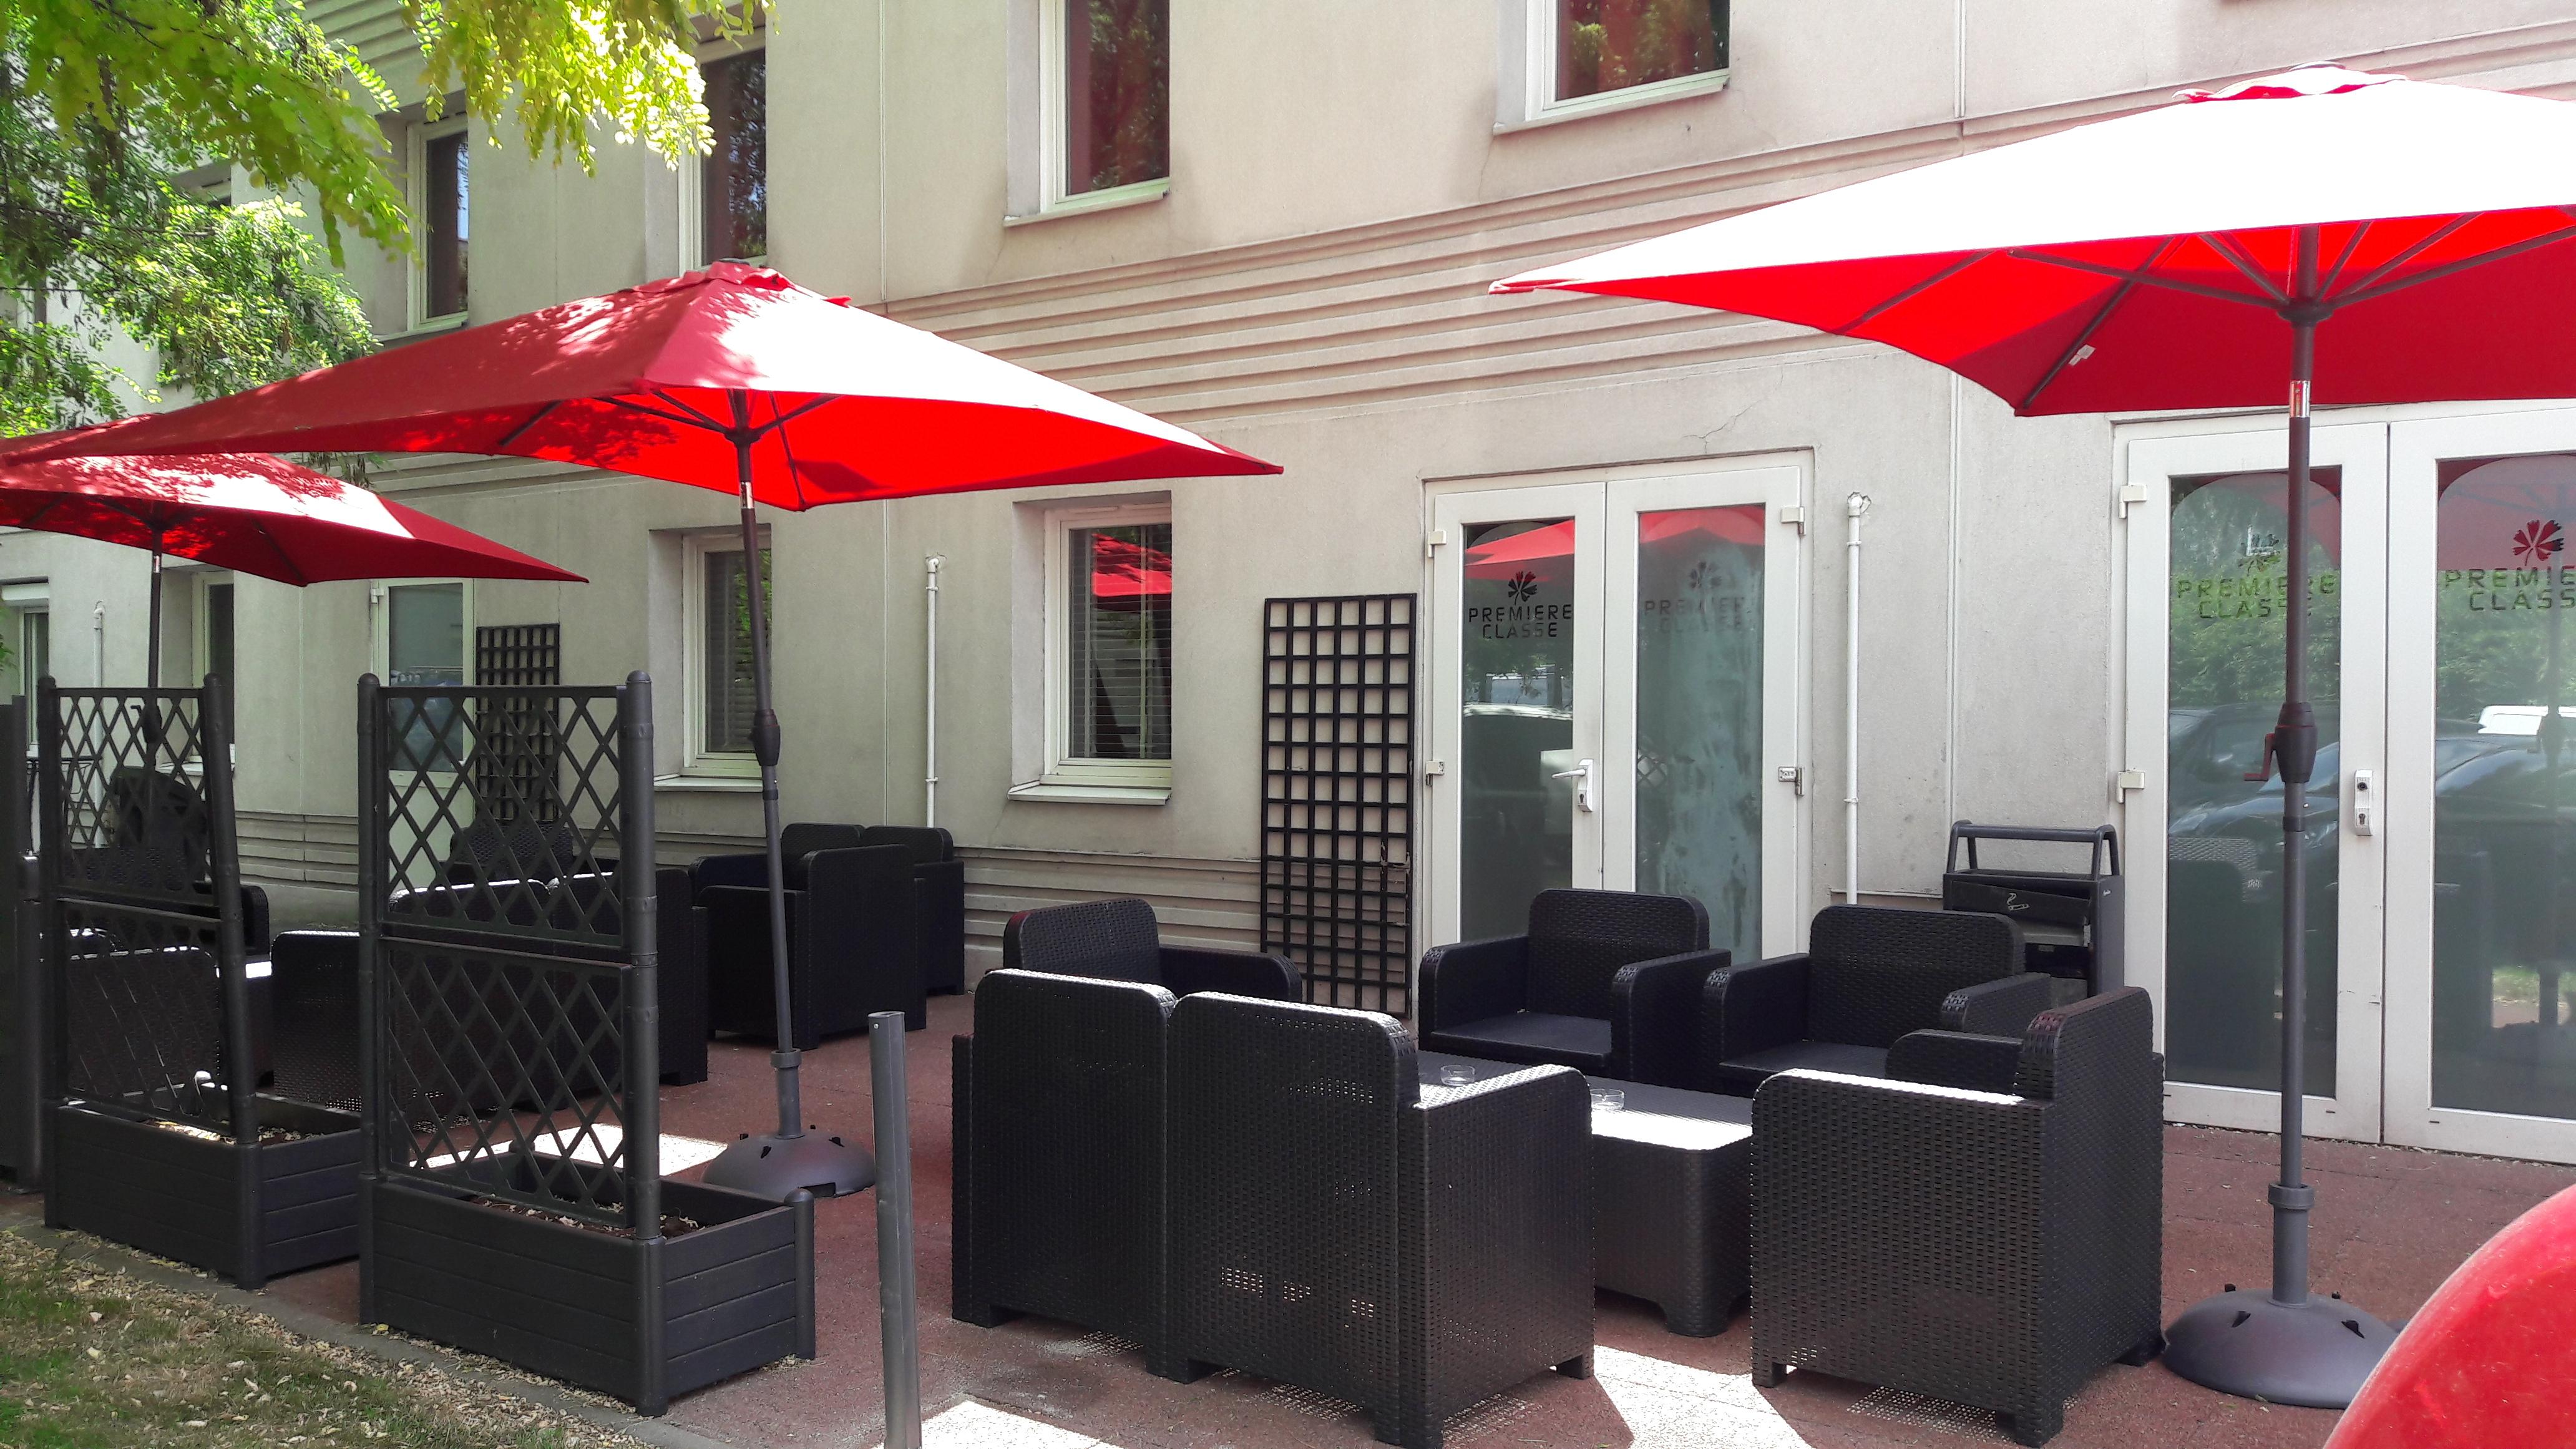 Premiere Classe Roissy CDG Paris Nord II